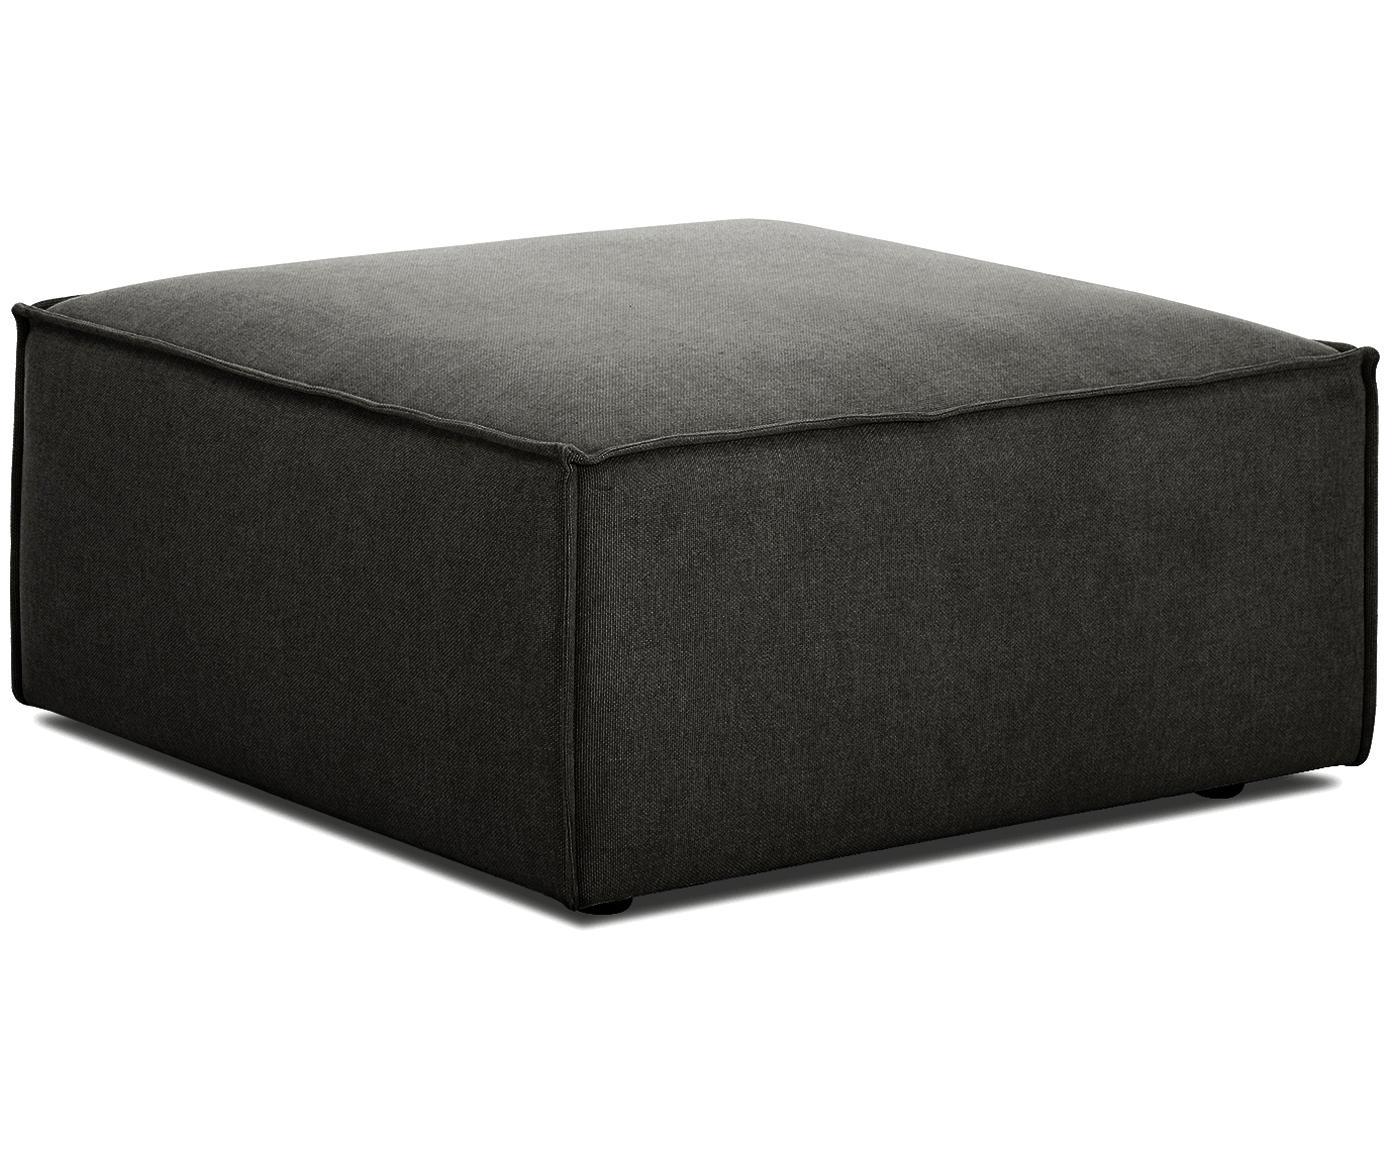 Sofa-Hocker Lennon, Bezug: Polyester 35.000 Scheuert, Gestell: Massives Kiefernholz, Spe, Webstoff Anthrazit, 88 x 43 cm